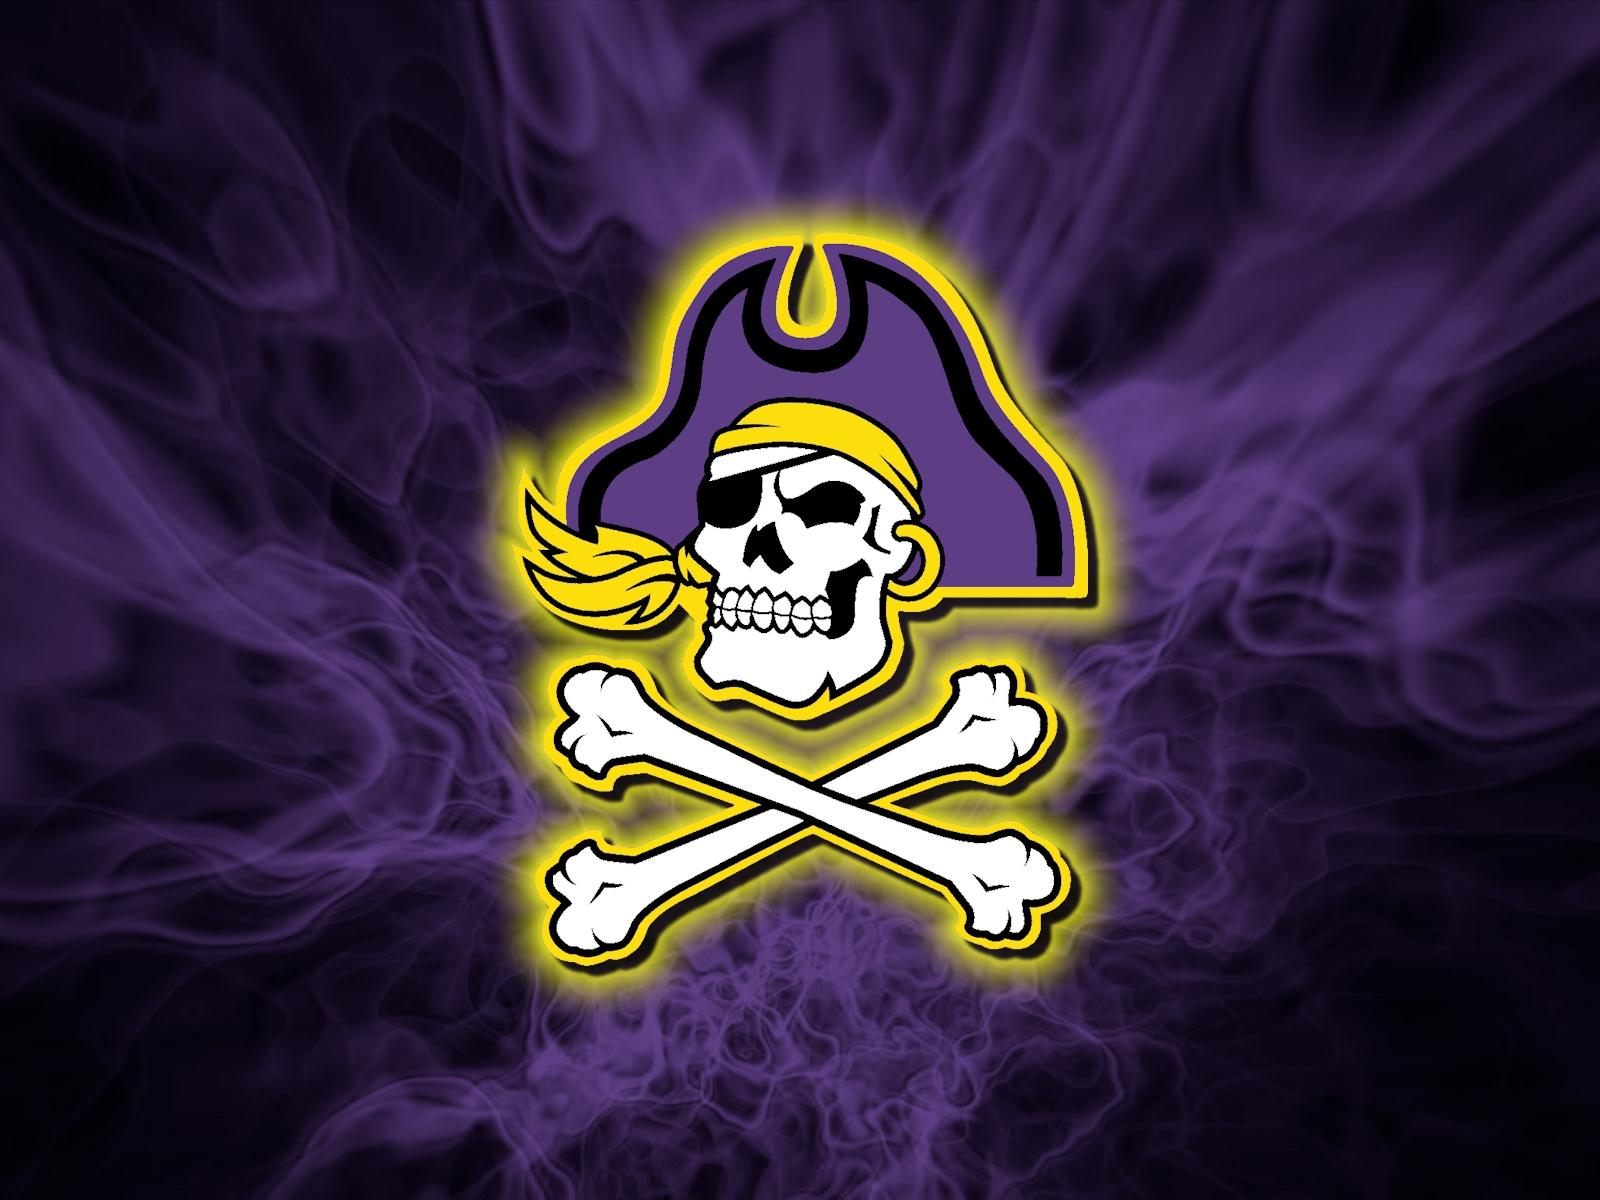 ... pirates wallpaper 1000 x 288 jpeg 65kb ecu pirates 87 logo http